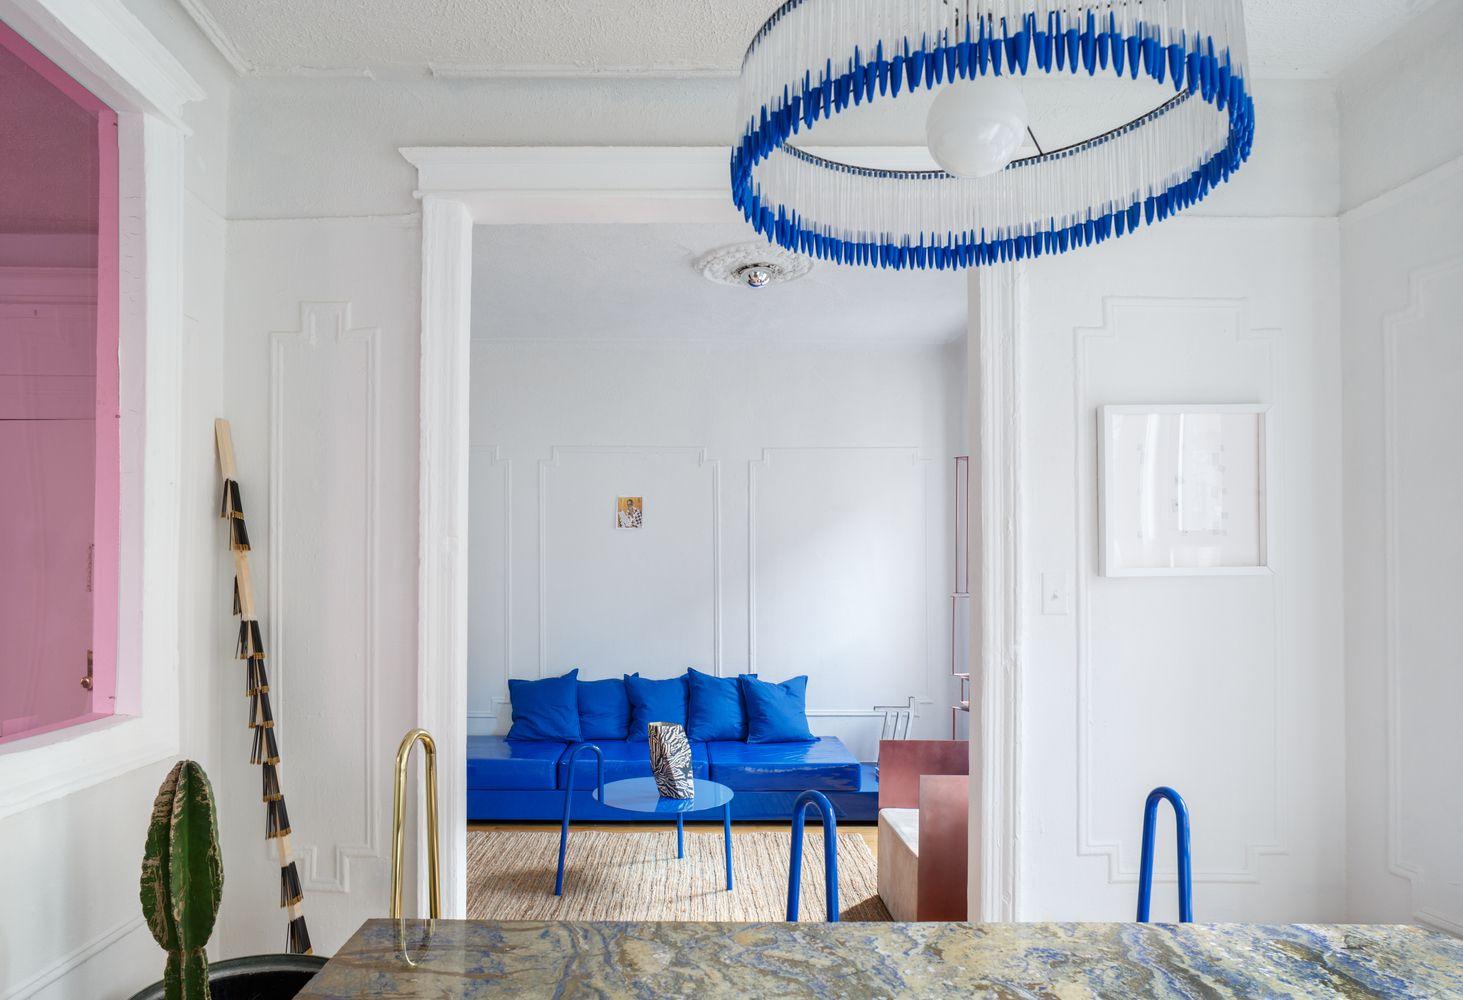 Gallery of Apartment in New York / Crosby Studios 23 in